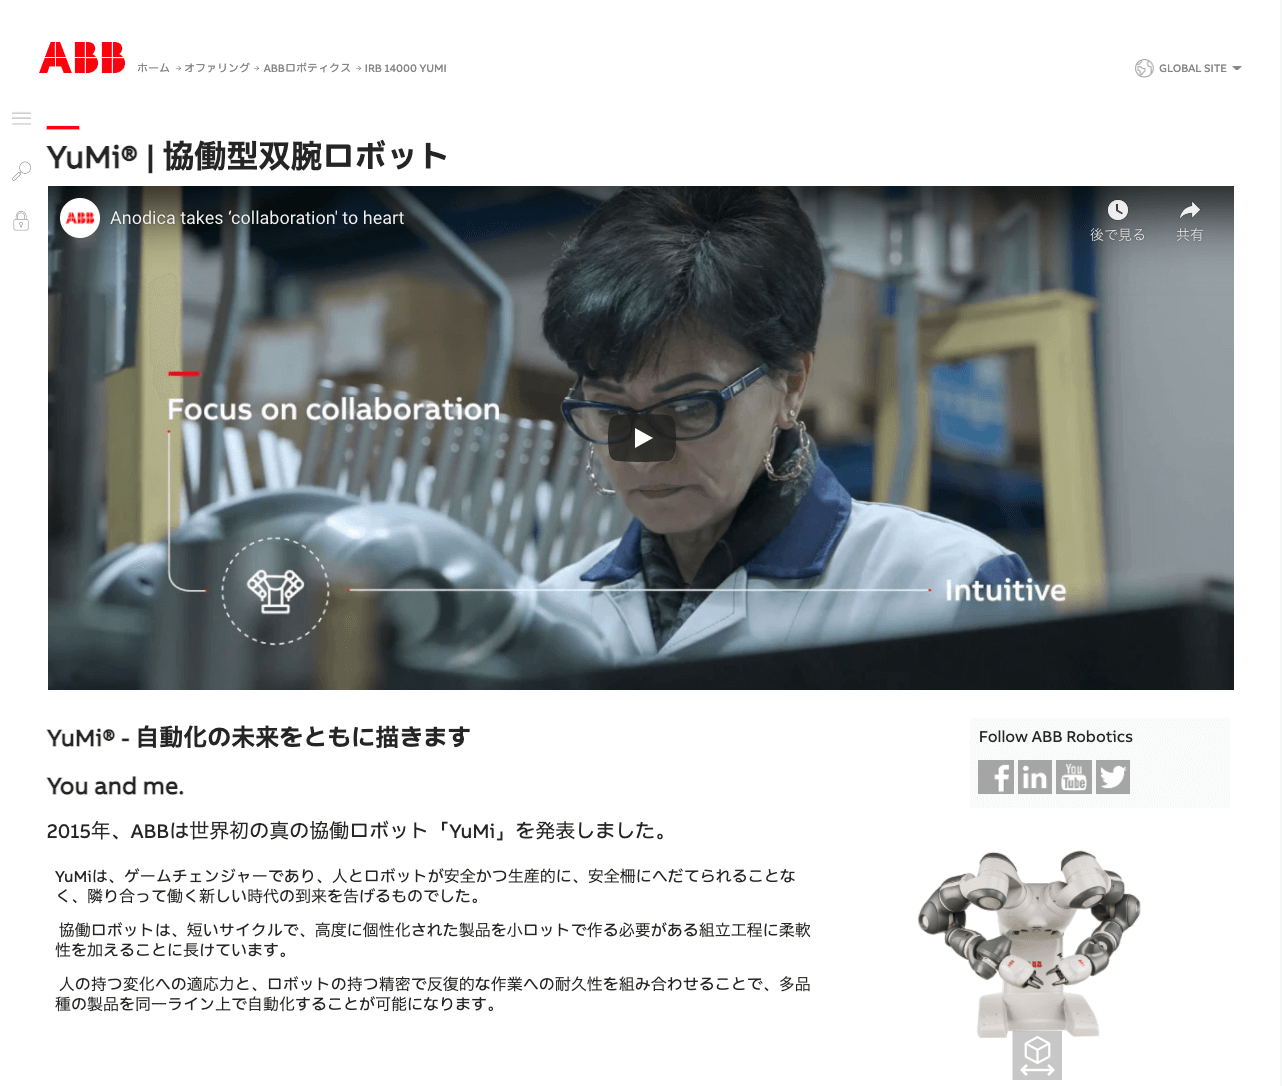 YuMi® | 協働型双腕ロボット